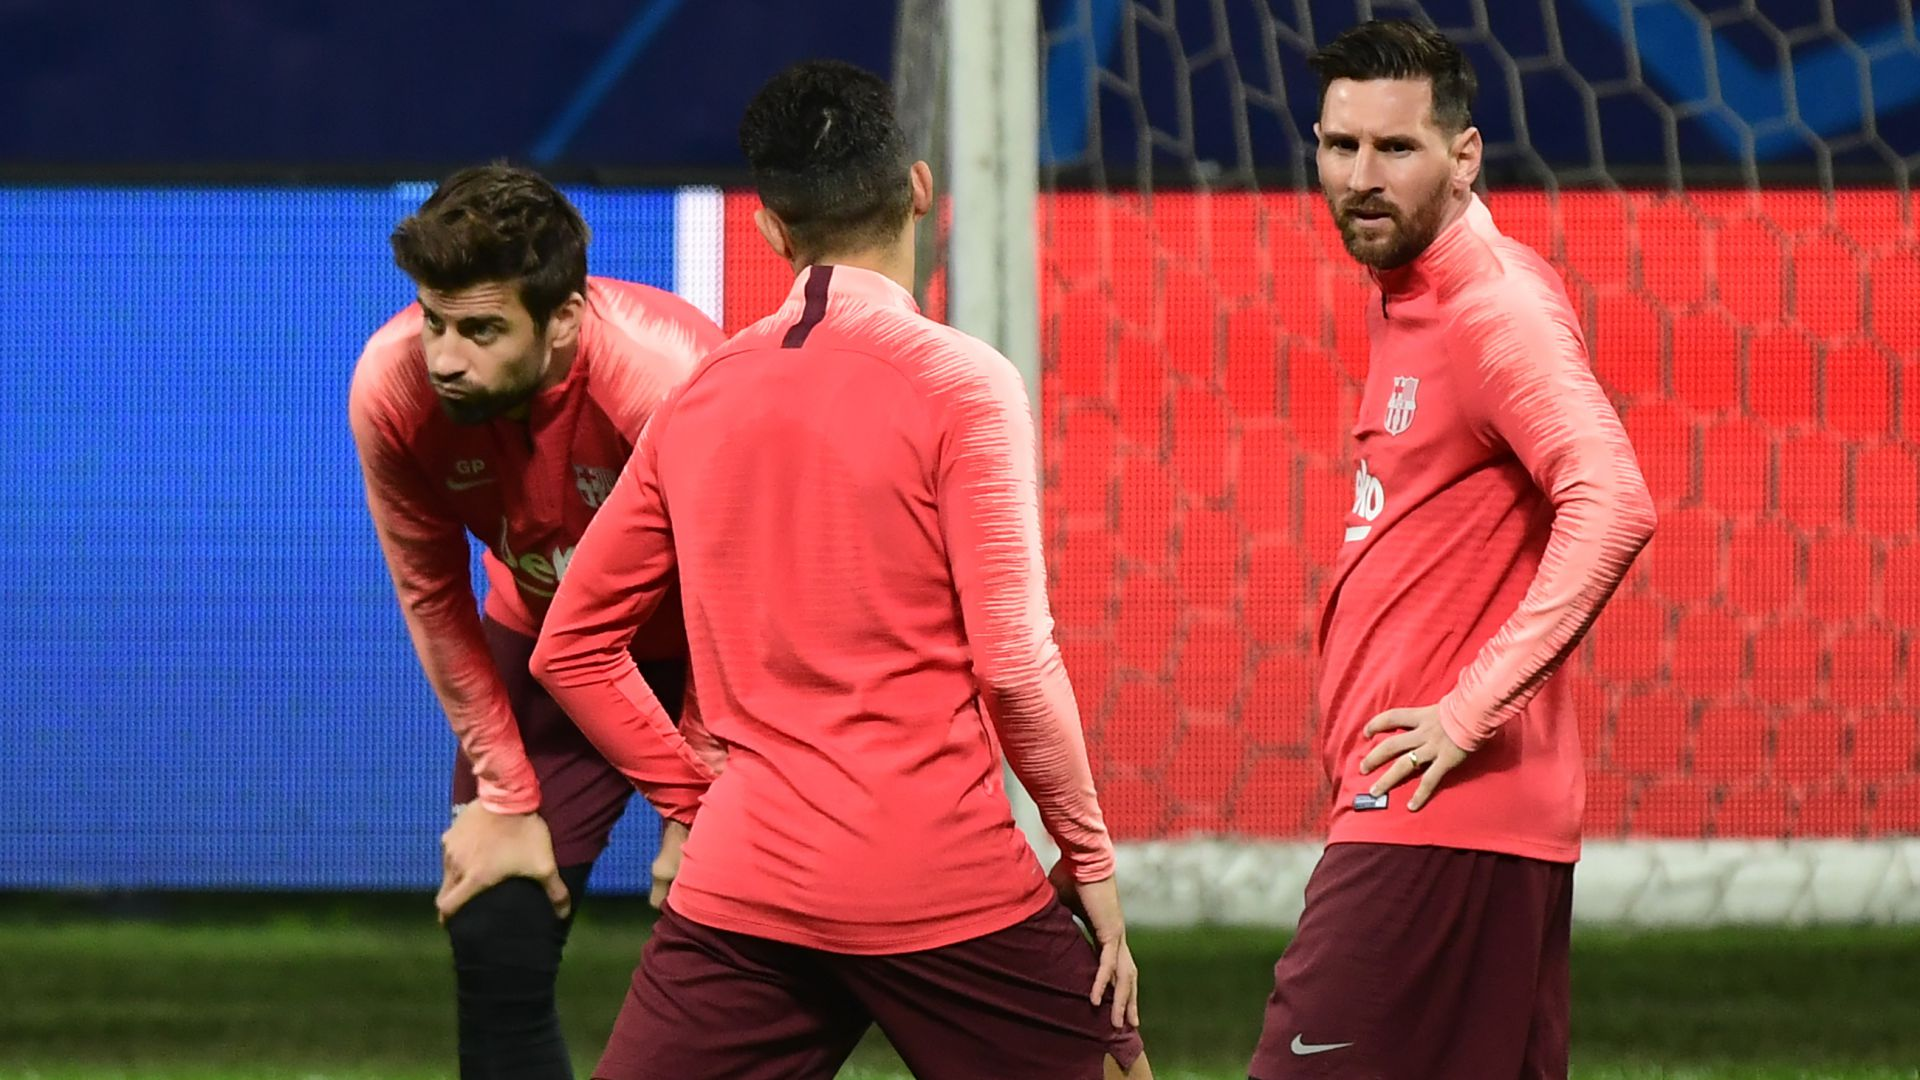 La Liga clubs return to training in groups of 10 following coronavirus-enforced suspension